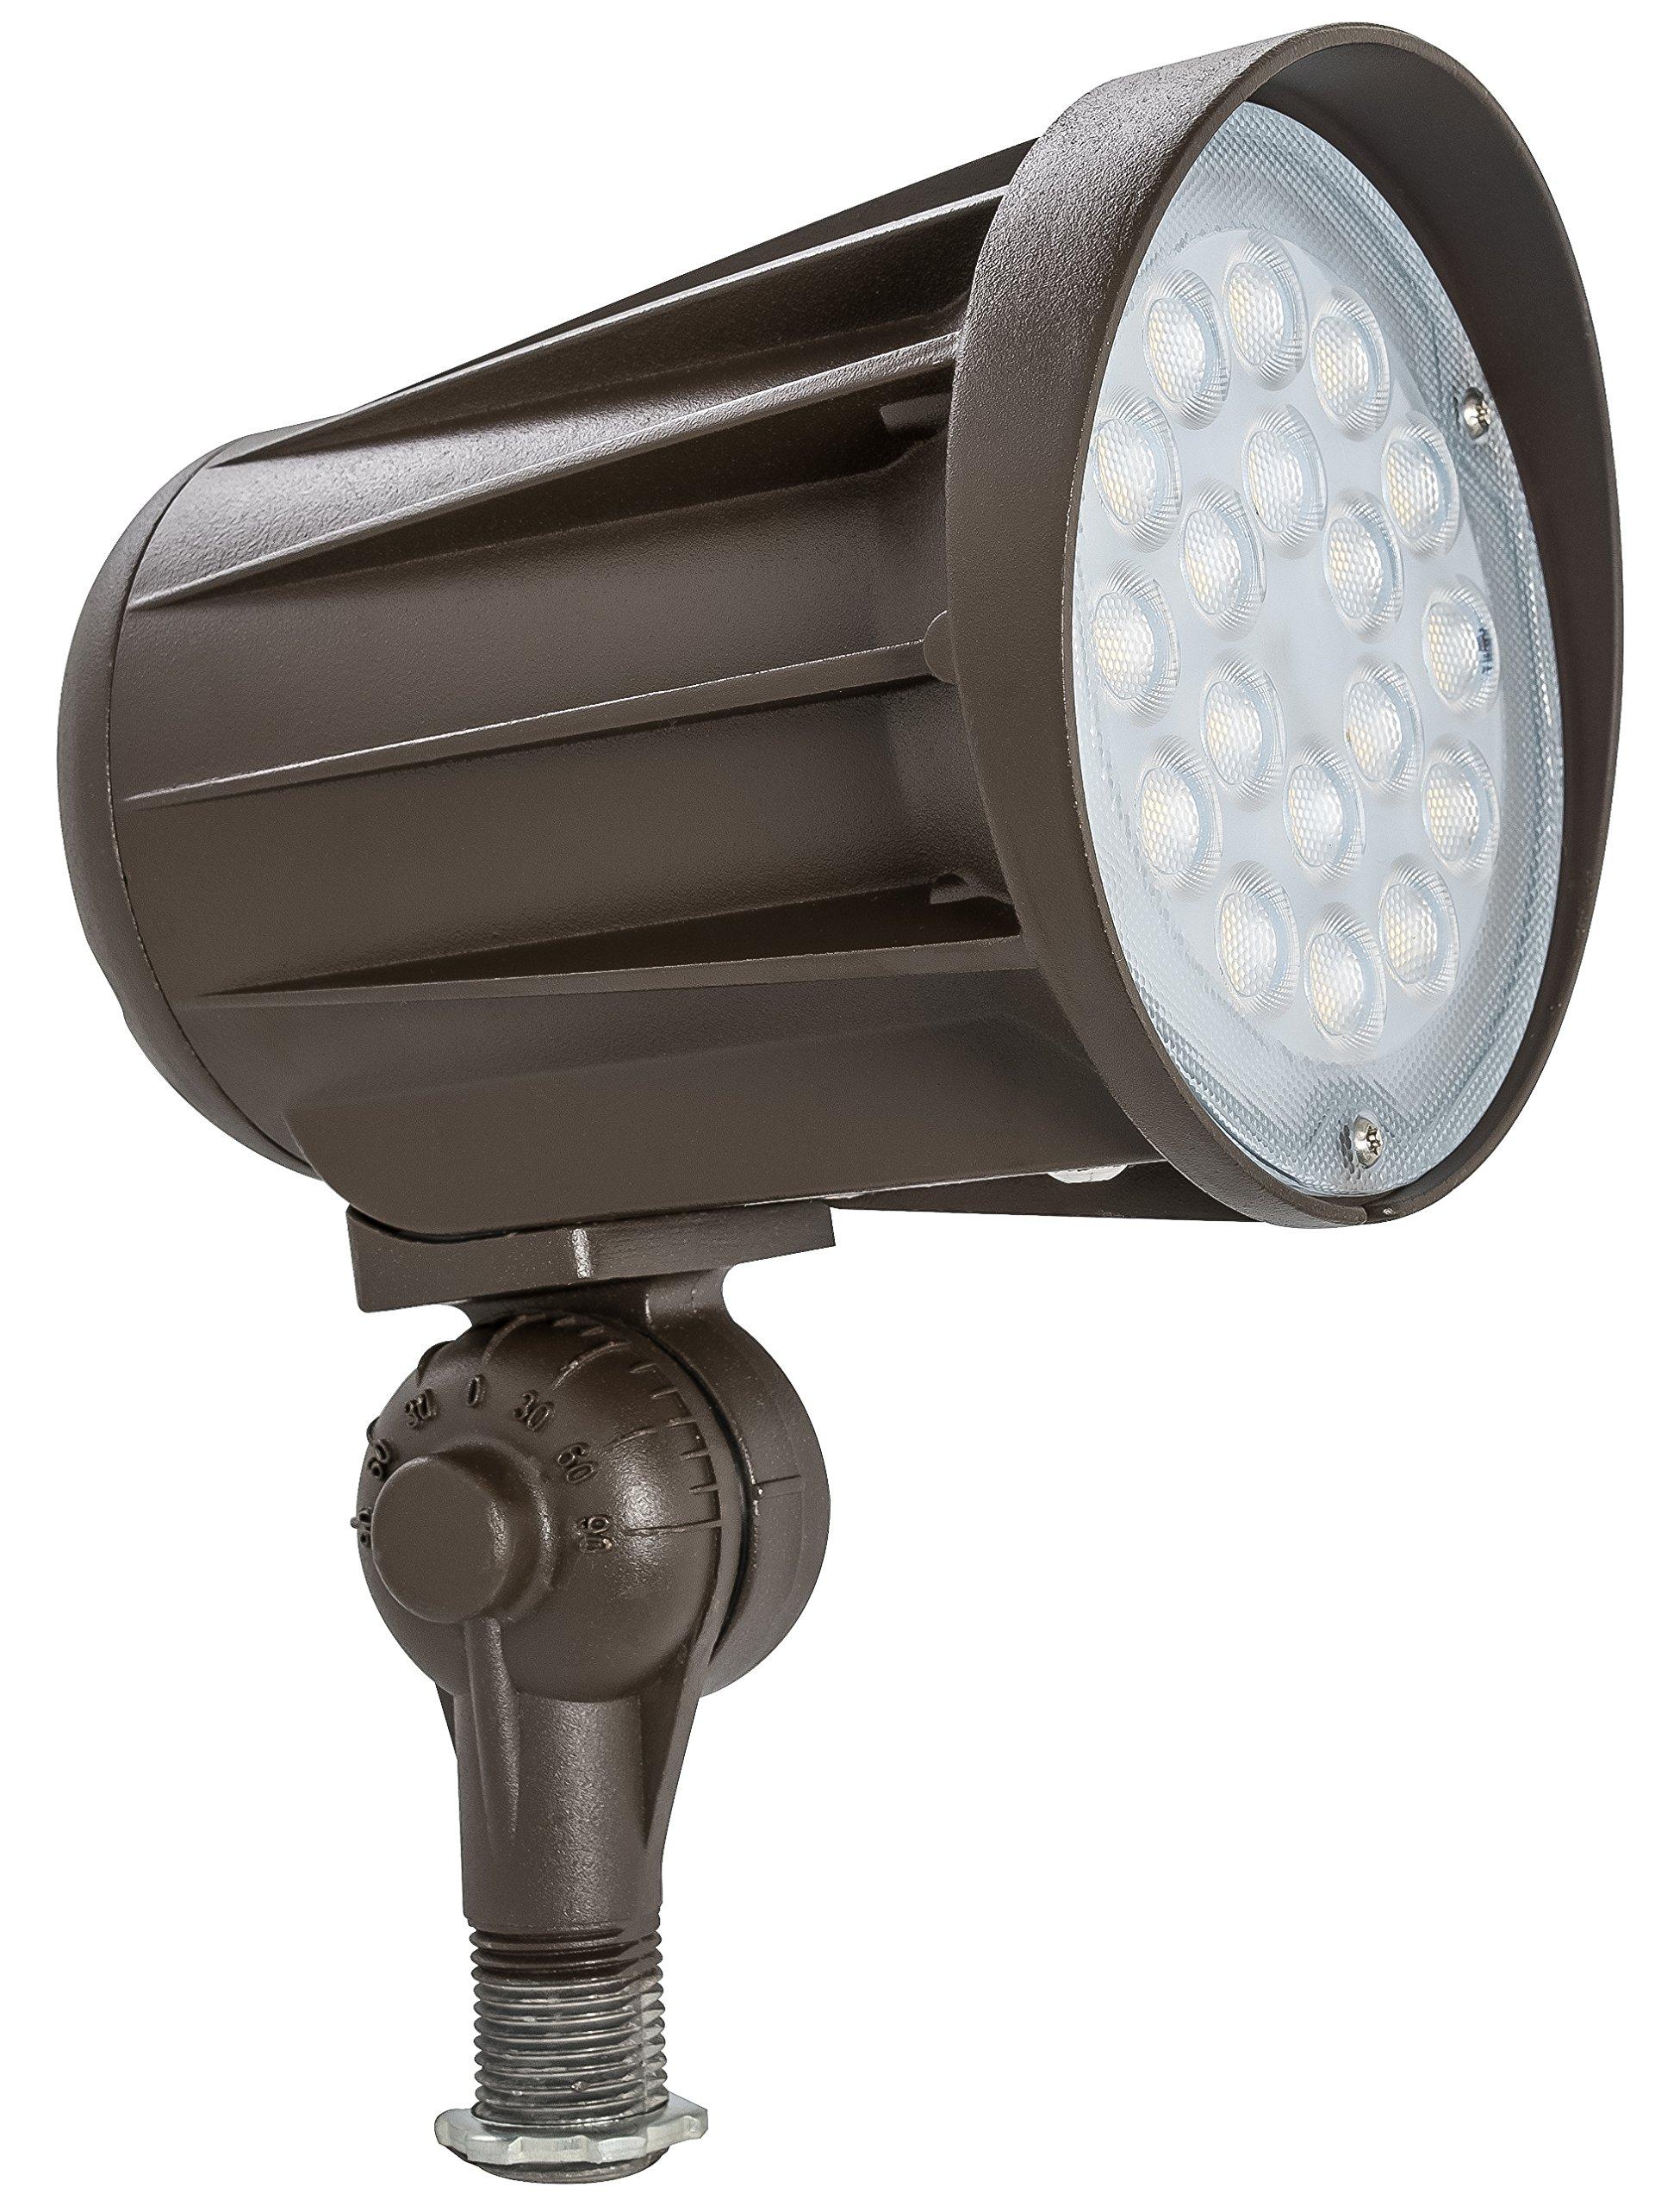 Westgate Lighting LED Outdoor Landscape Garden Bullet Flood Lights - Path Walkway Lawn Spotlights - Knuckle Mount - IP65 Waterproof - High Lumen - UL/DLC Listed - 120-277V (42W, 5000K knuckle)